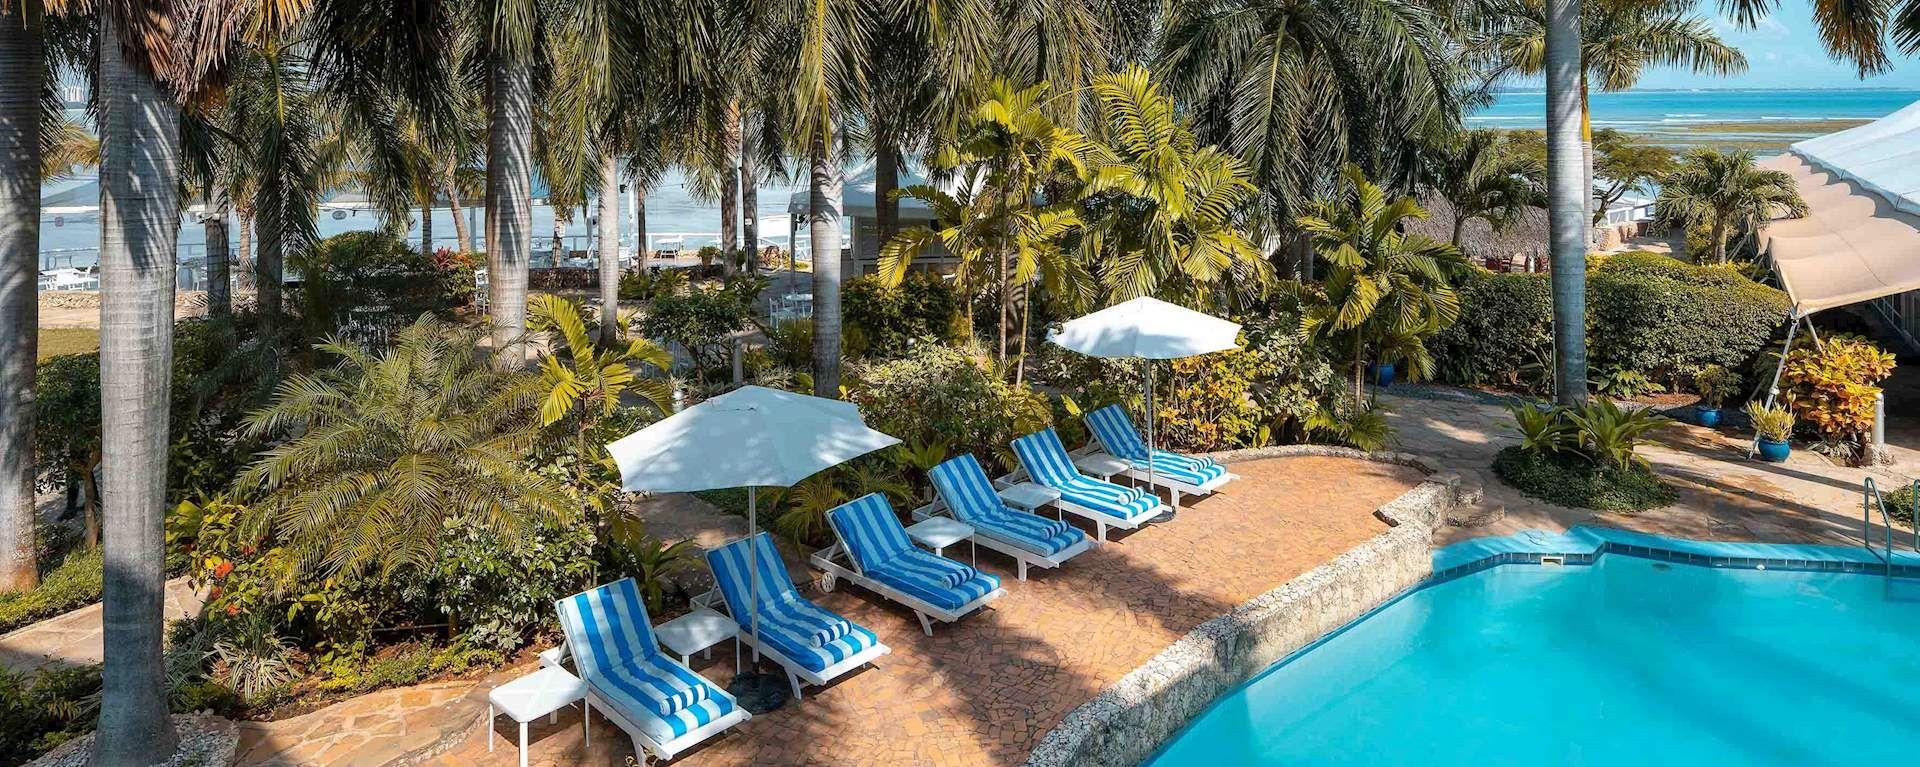 Best Western Coral Beach Hotel4